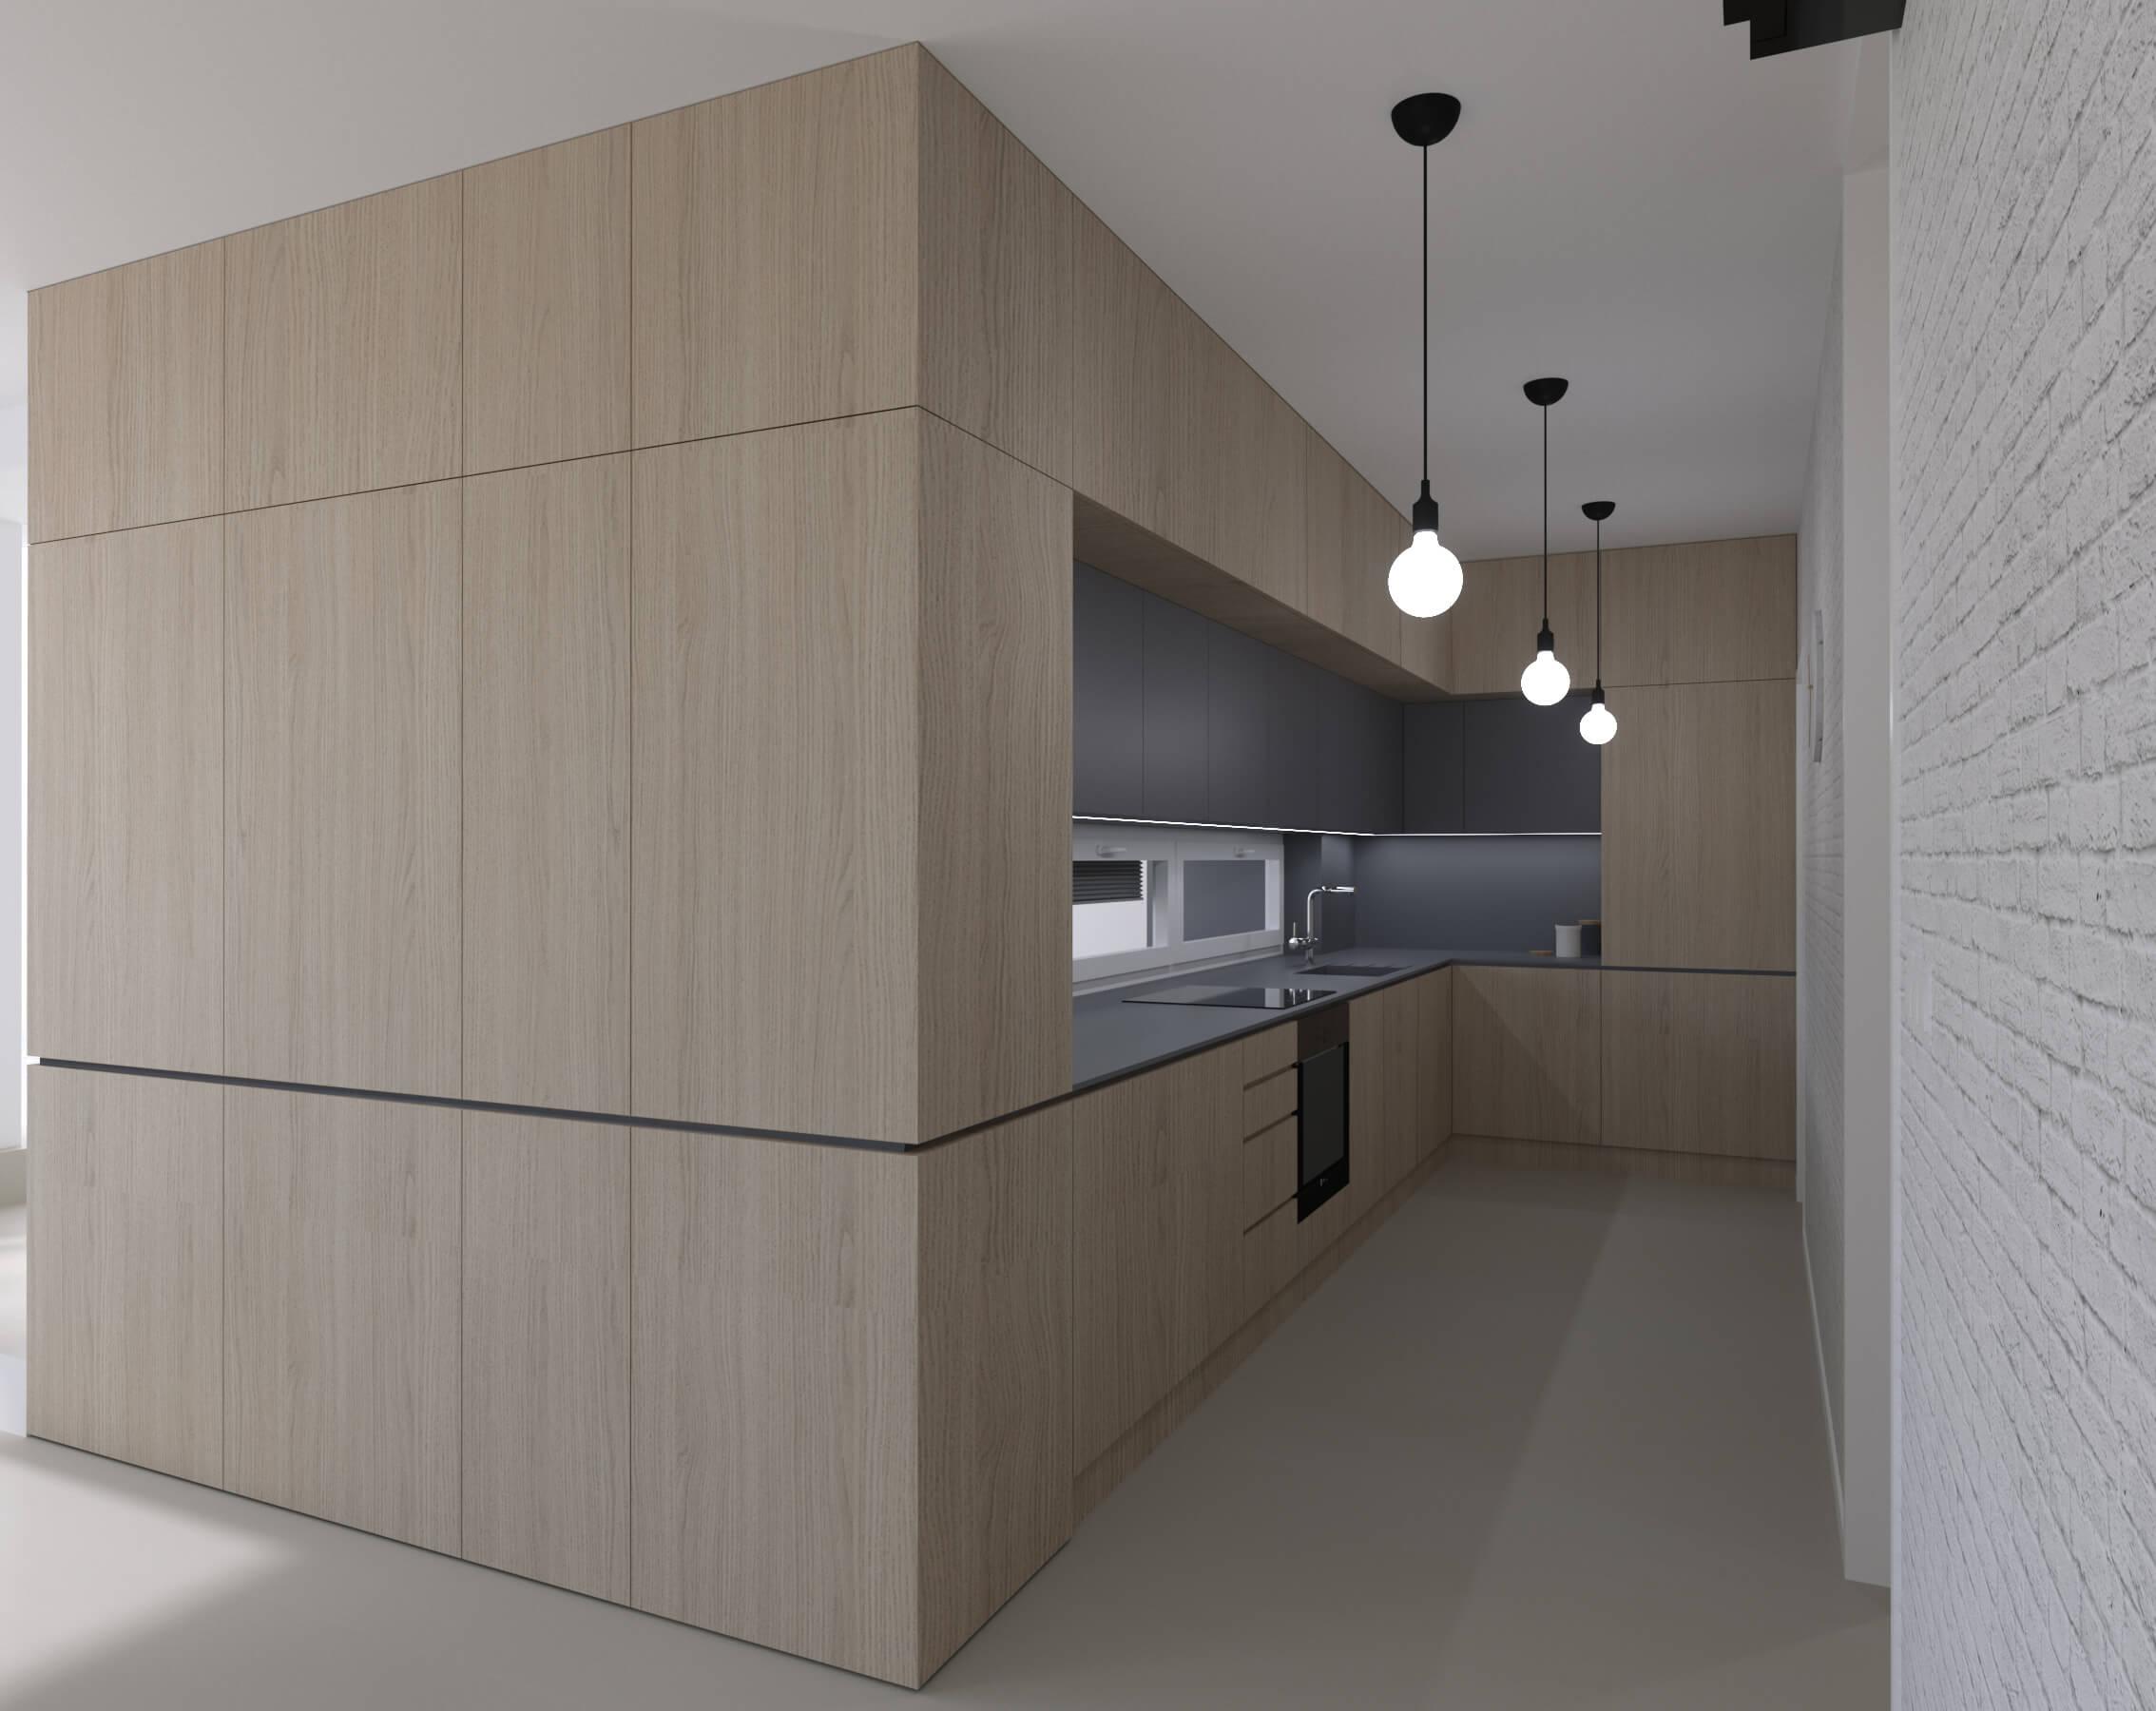 06_kuchyna